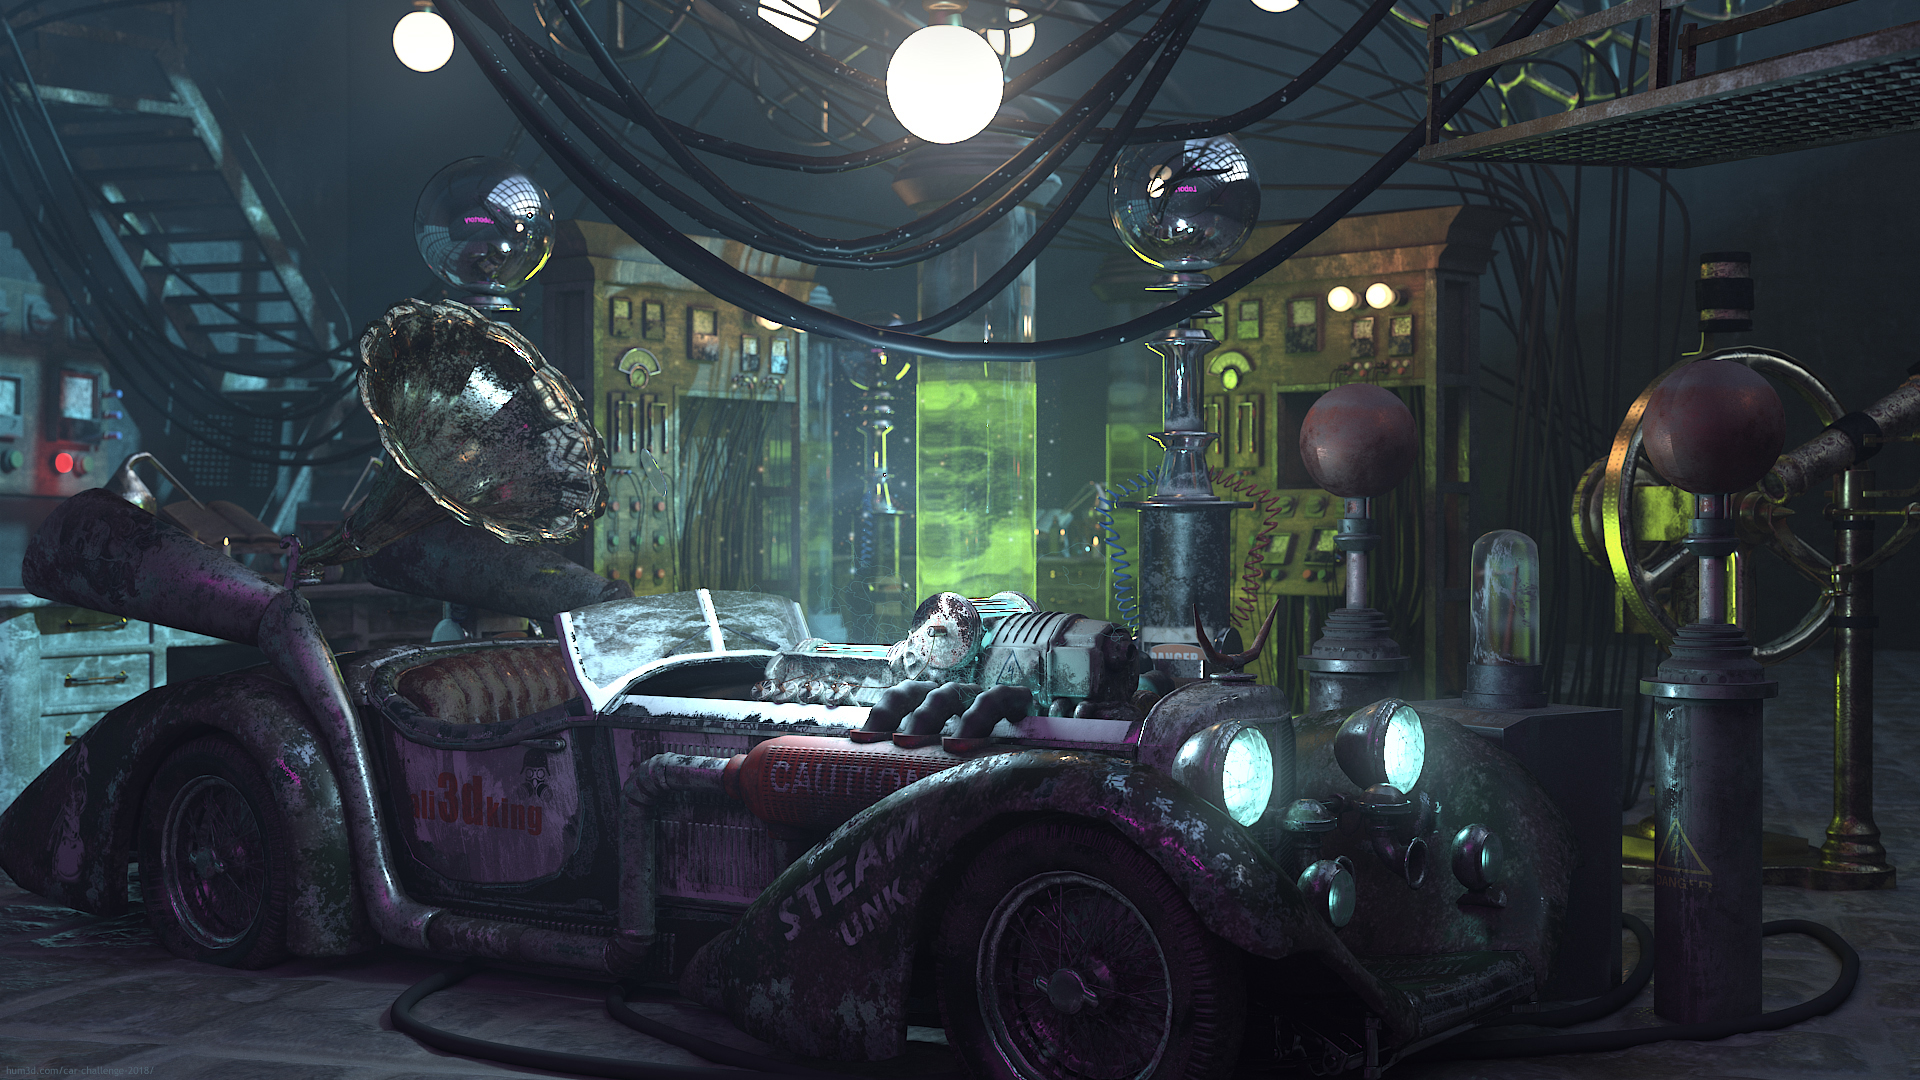 Fantasy Tesla Car 3d art